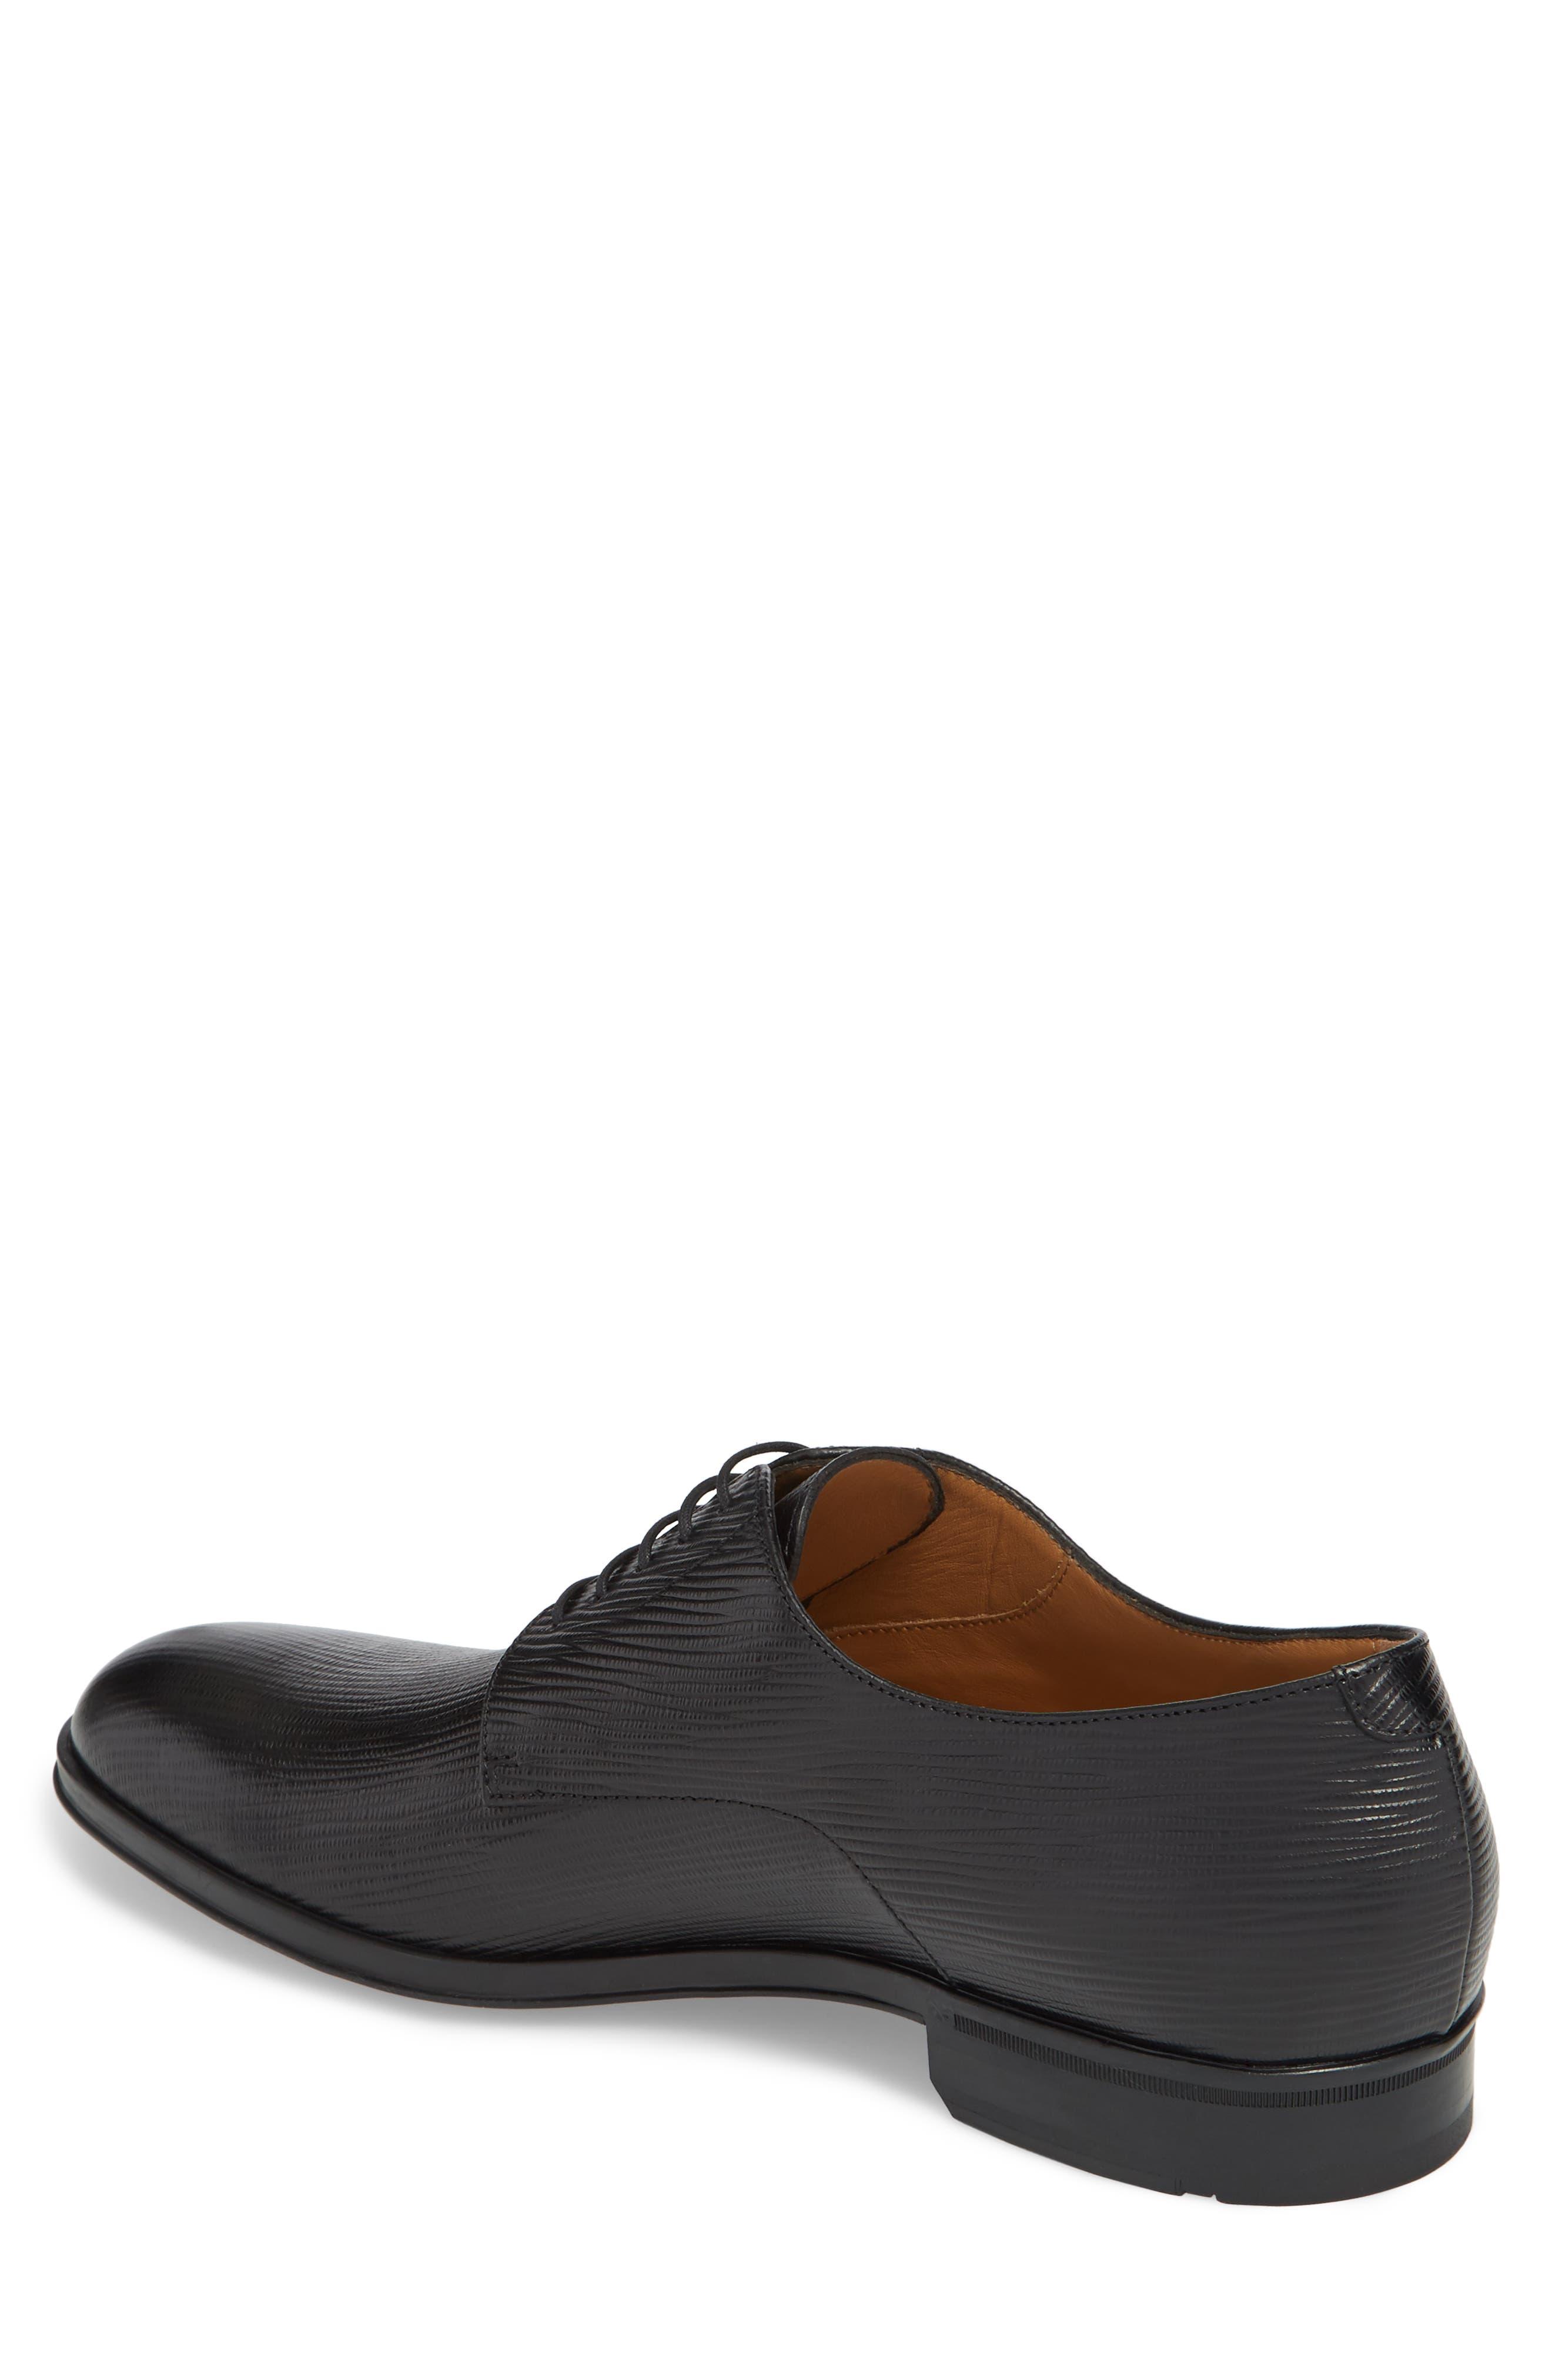 Eton Plain Toe Derby,                             Alternate thumbnail 2, color,                             BLACK LEATHER